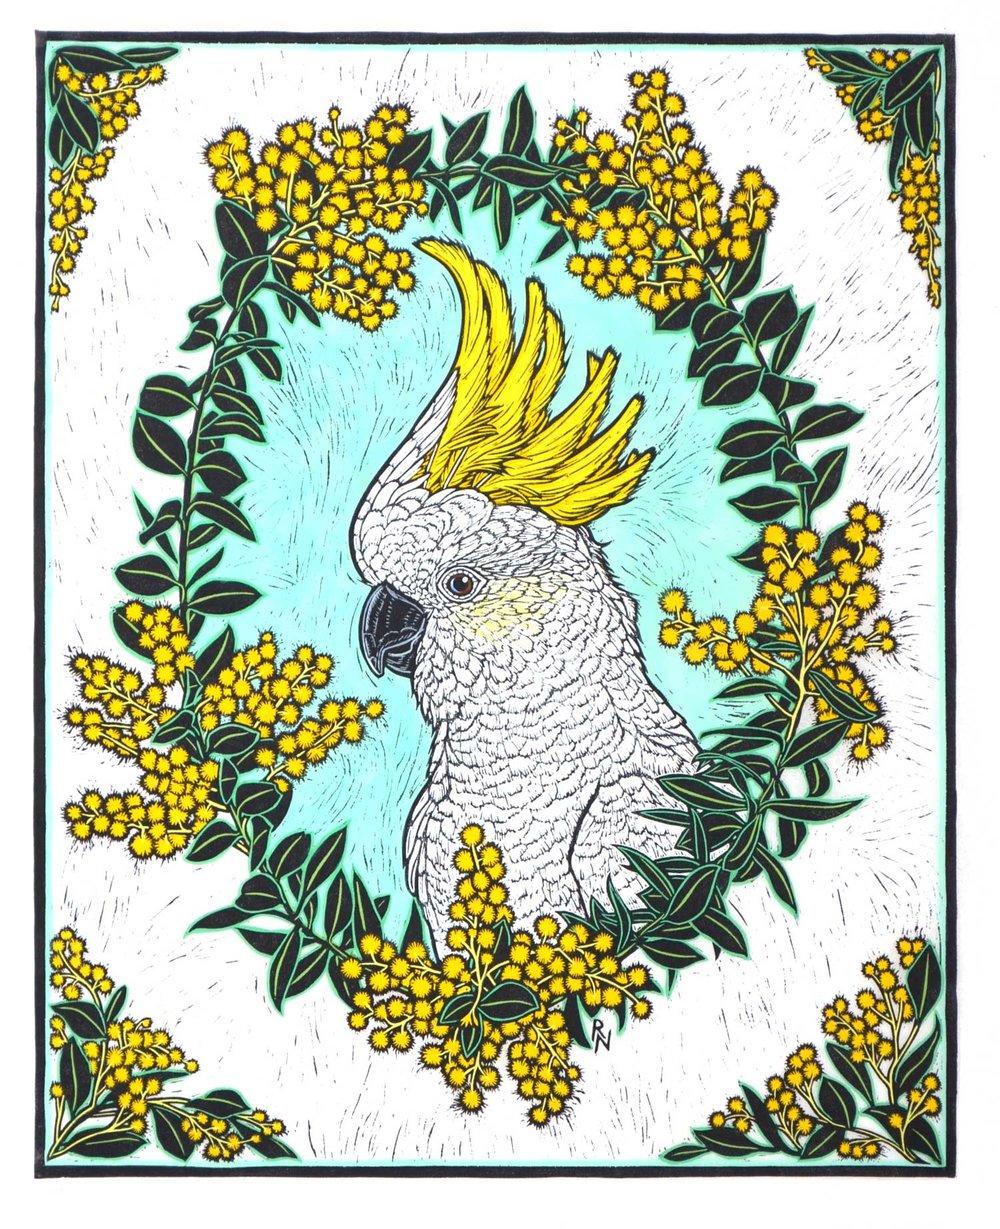 white-cockatoo-wattle-rachel-newling-linocut.jpg